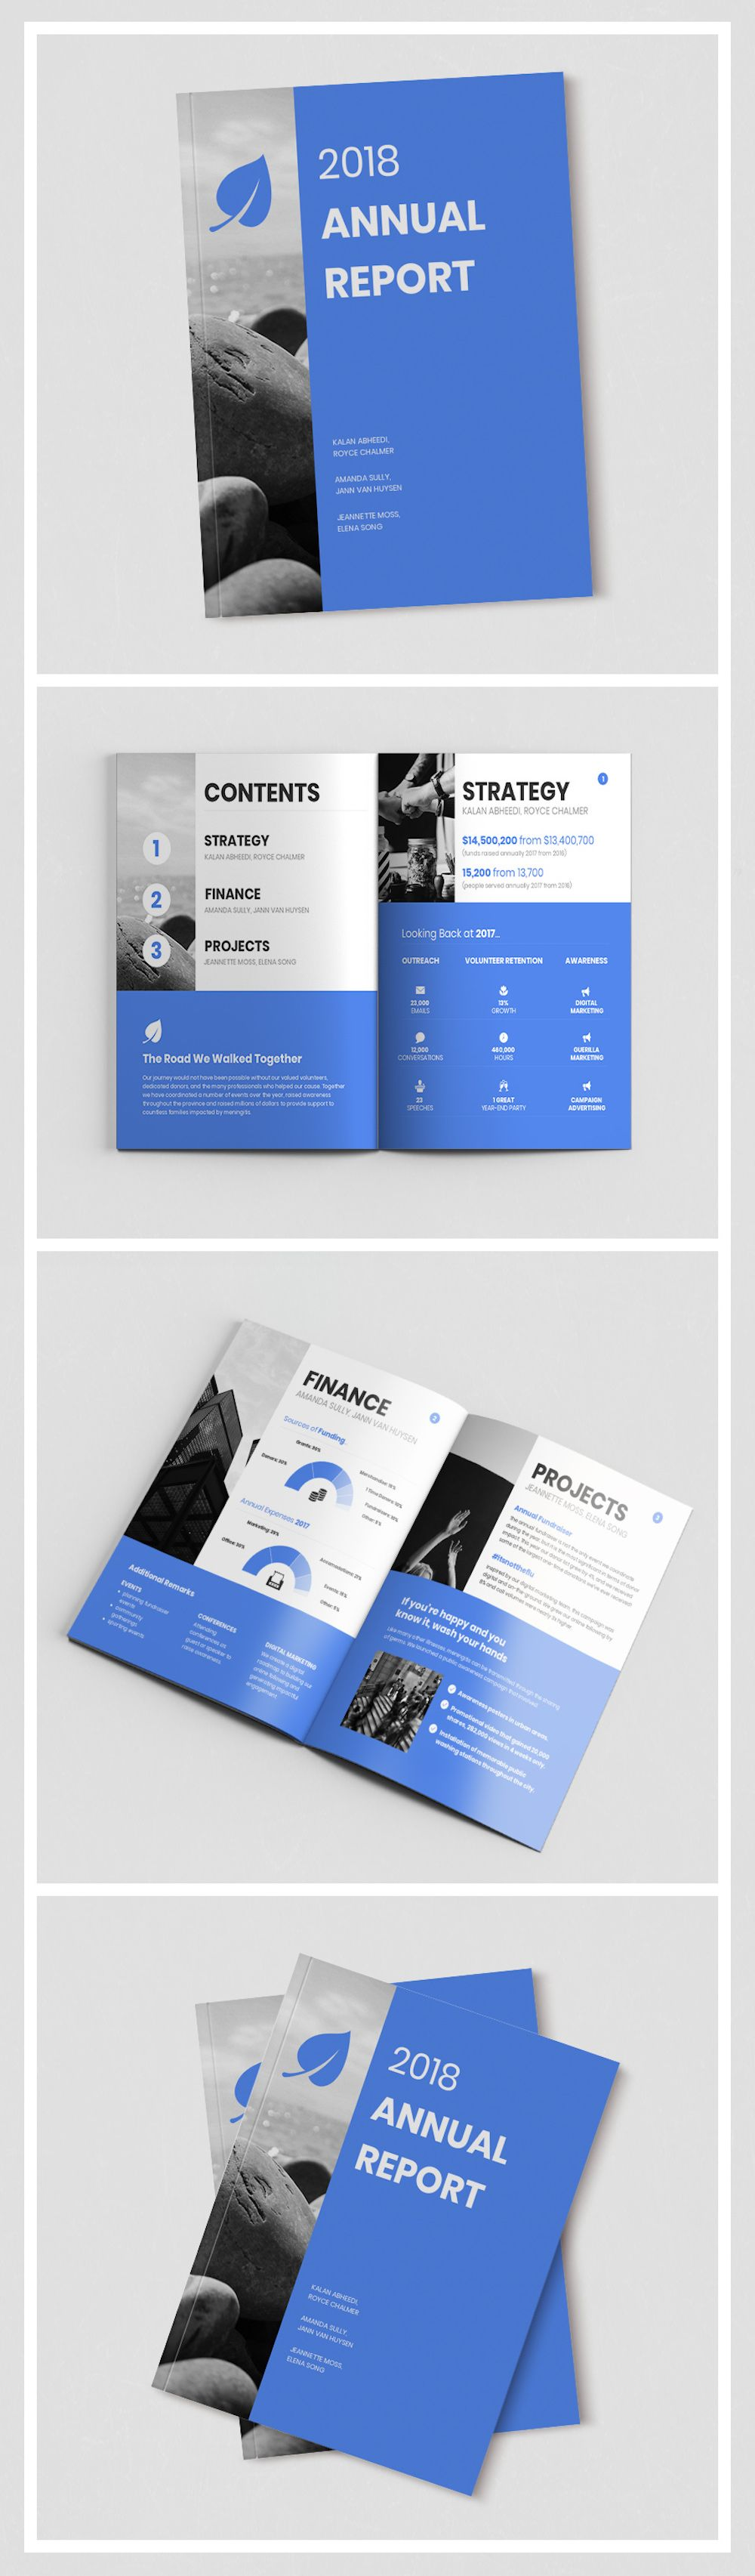 55+ Customizable Annual Report Design Templates, Examples & Tips #annualreports